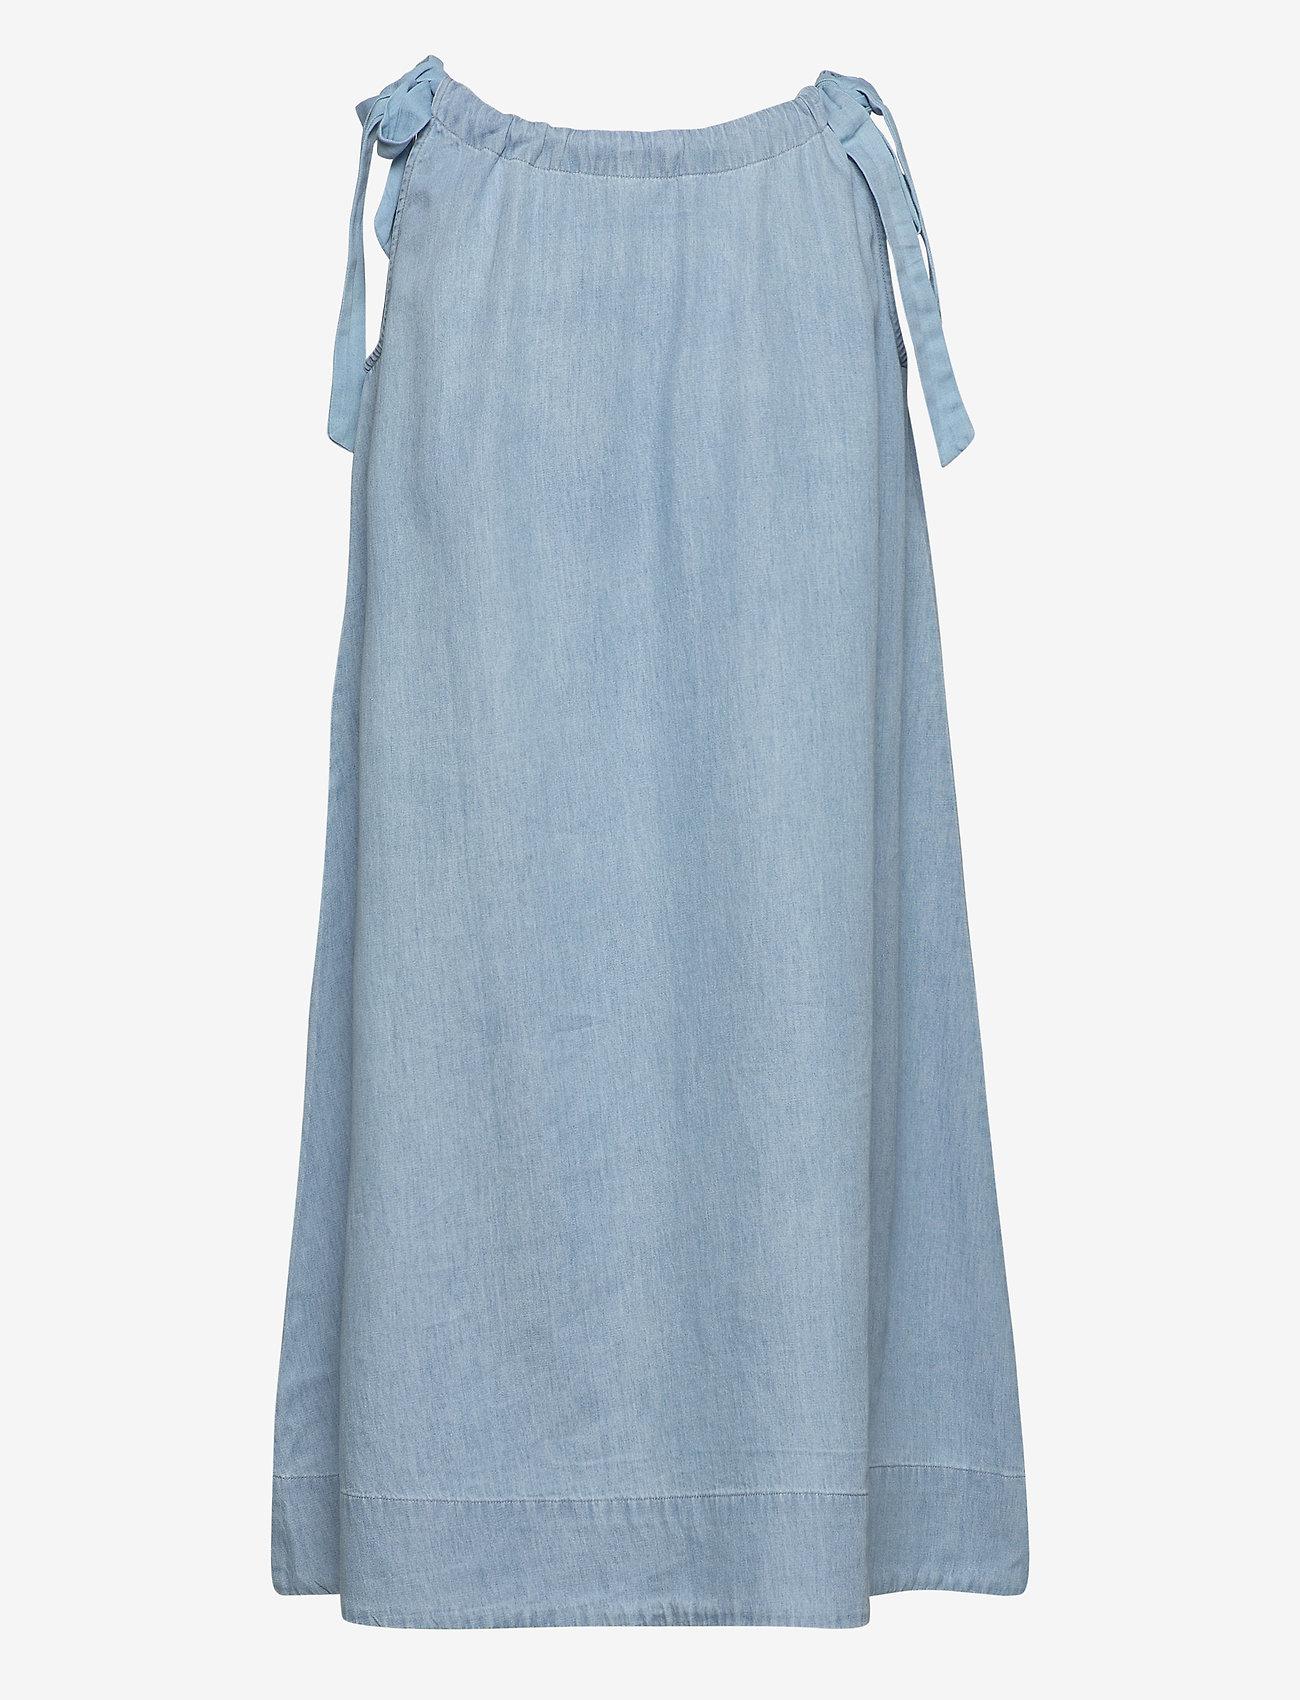 Selected Femme - SLFNOVO SL DRESS W - robes en jeans - light blue - 1